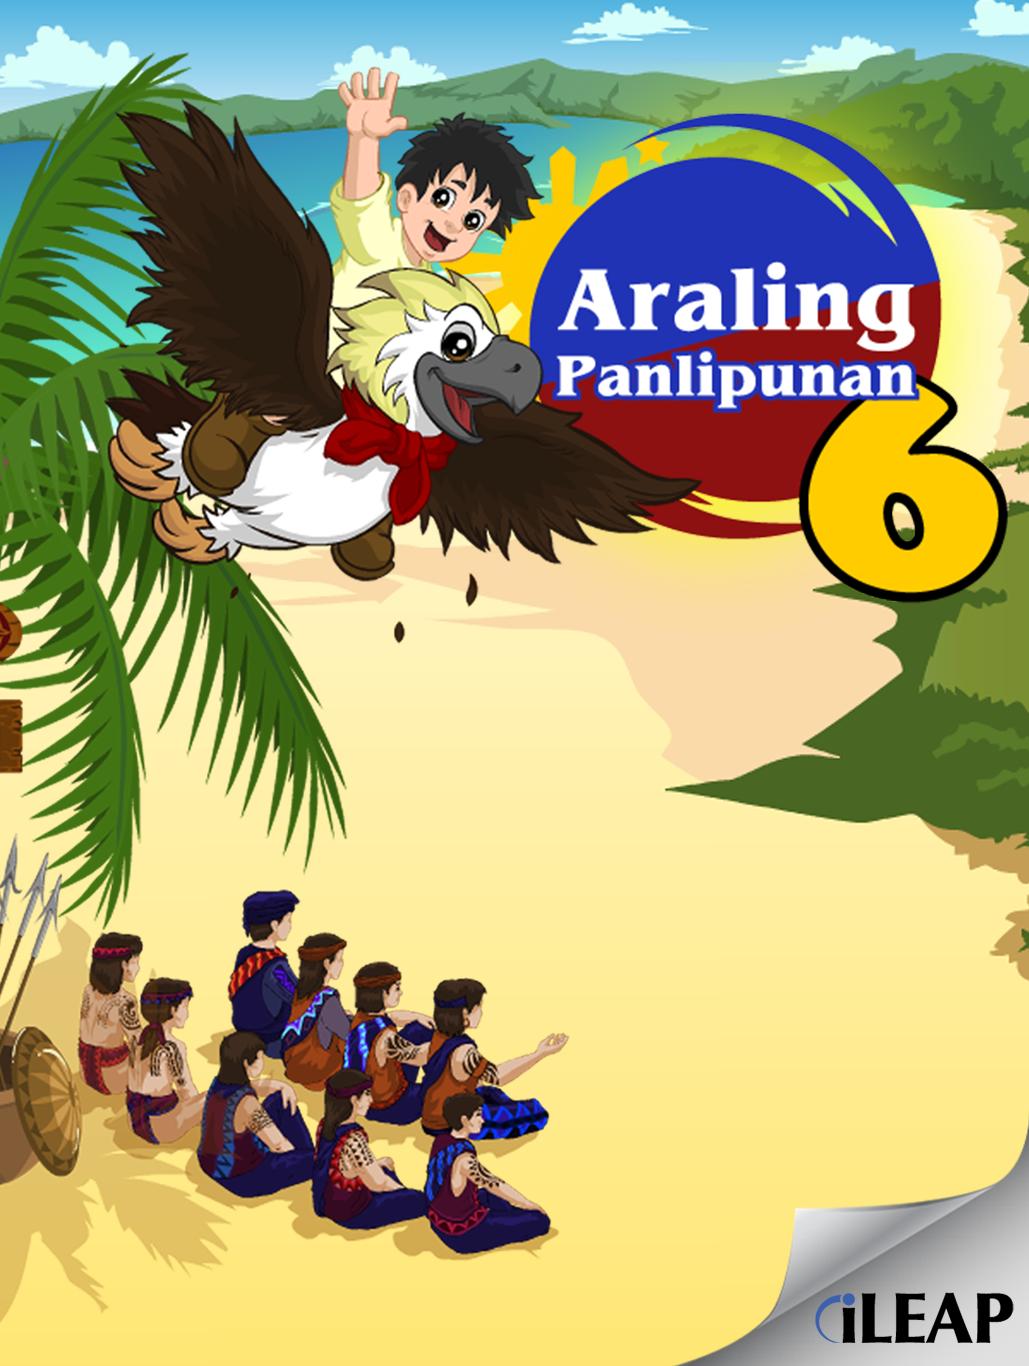 Mga E-Tests sa Araling Panlipunan 6 - course on mCourser